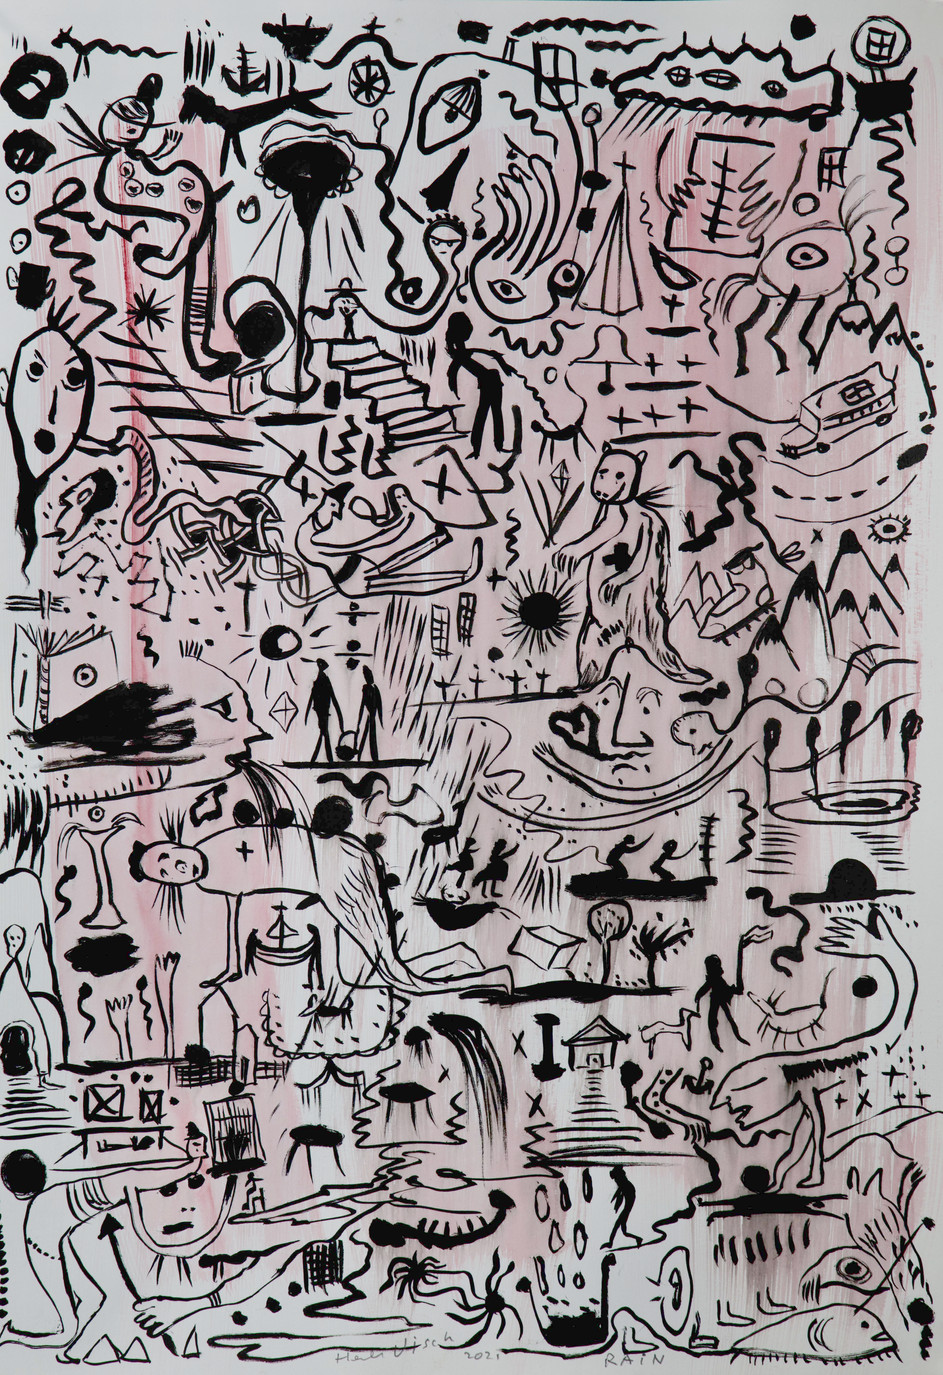 HENK VISCH Rain, 2021 water color, ink and pencil on paper 42 x 29,7 cm